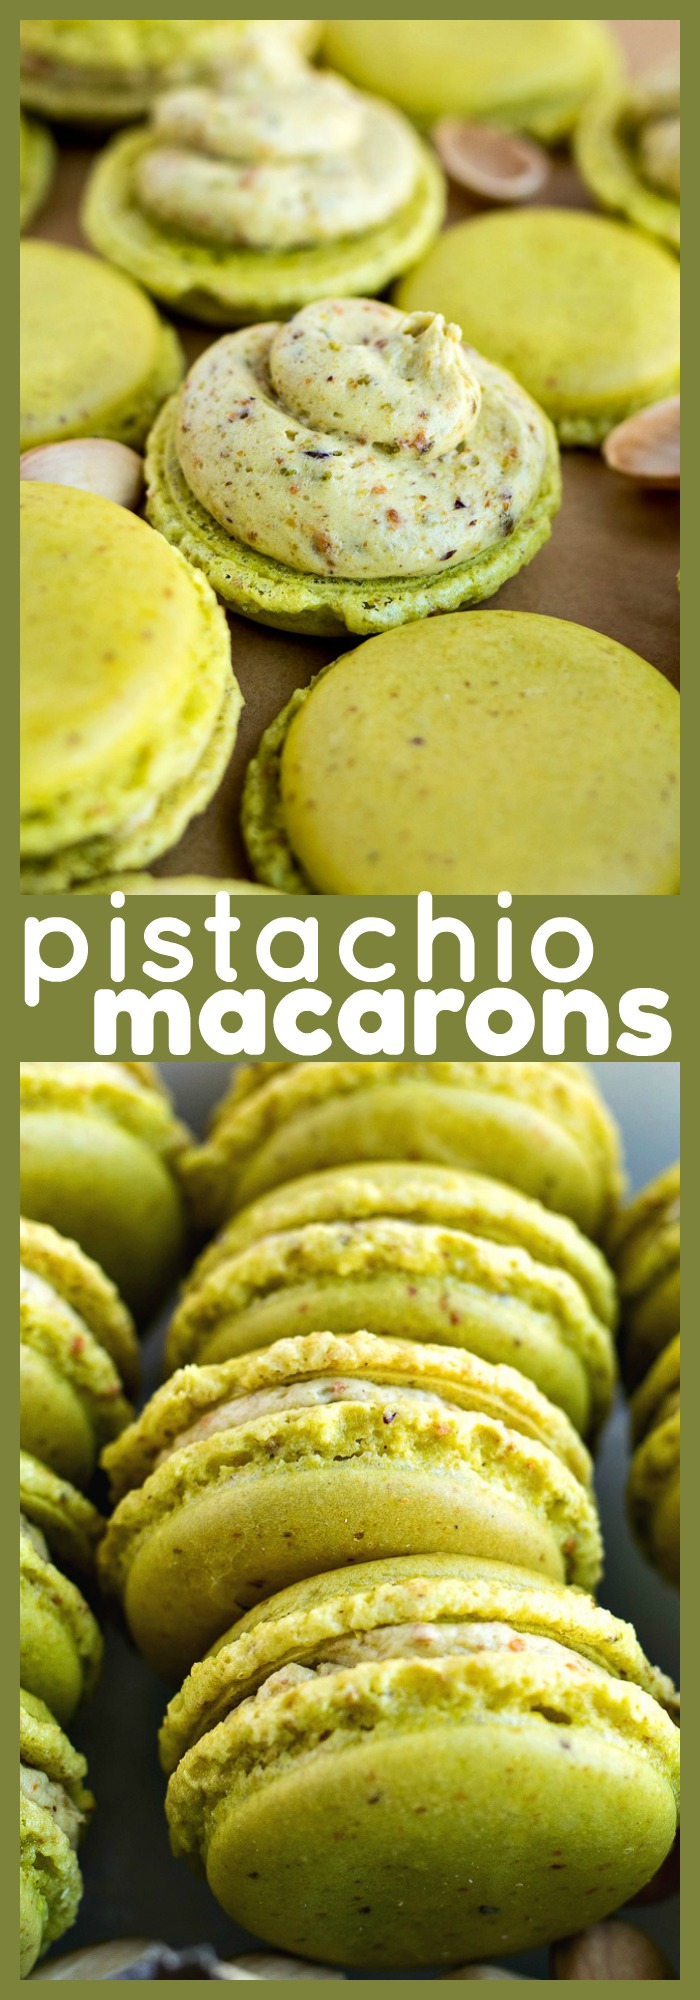 Pistachio Macarons photo collage